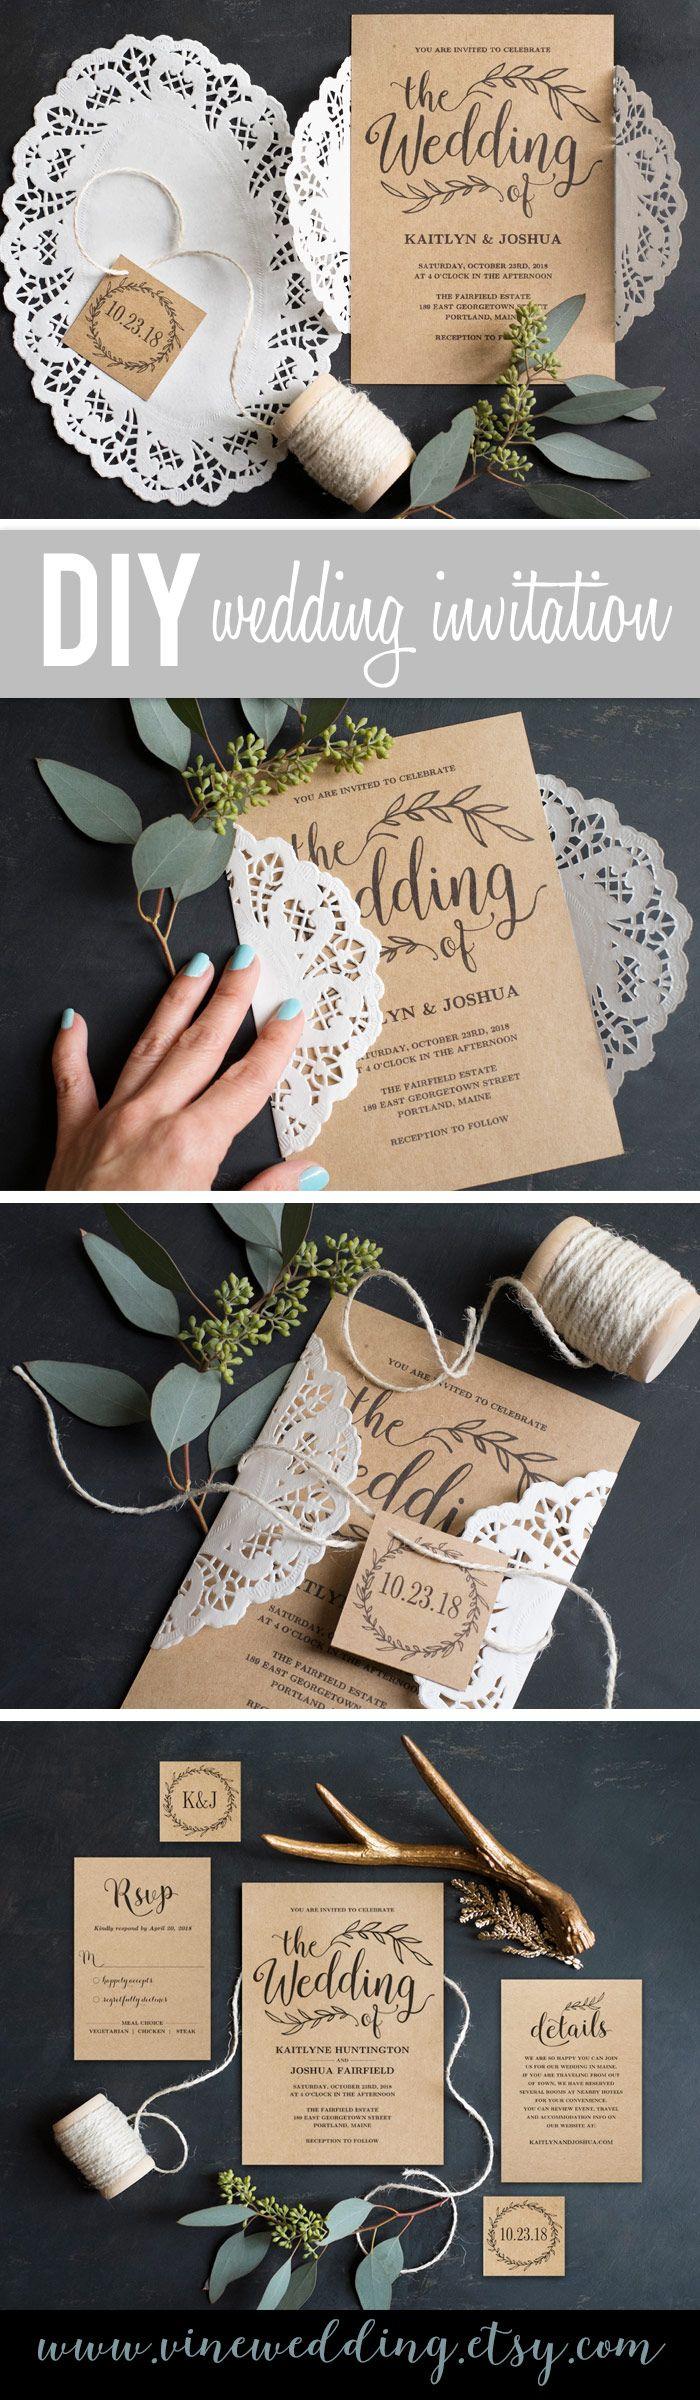 rustic wedding invitations budget wedding invitations Wedding Invitations Affordable